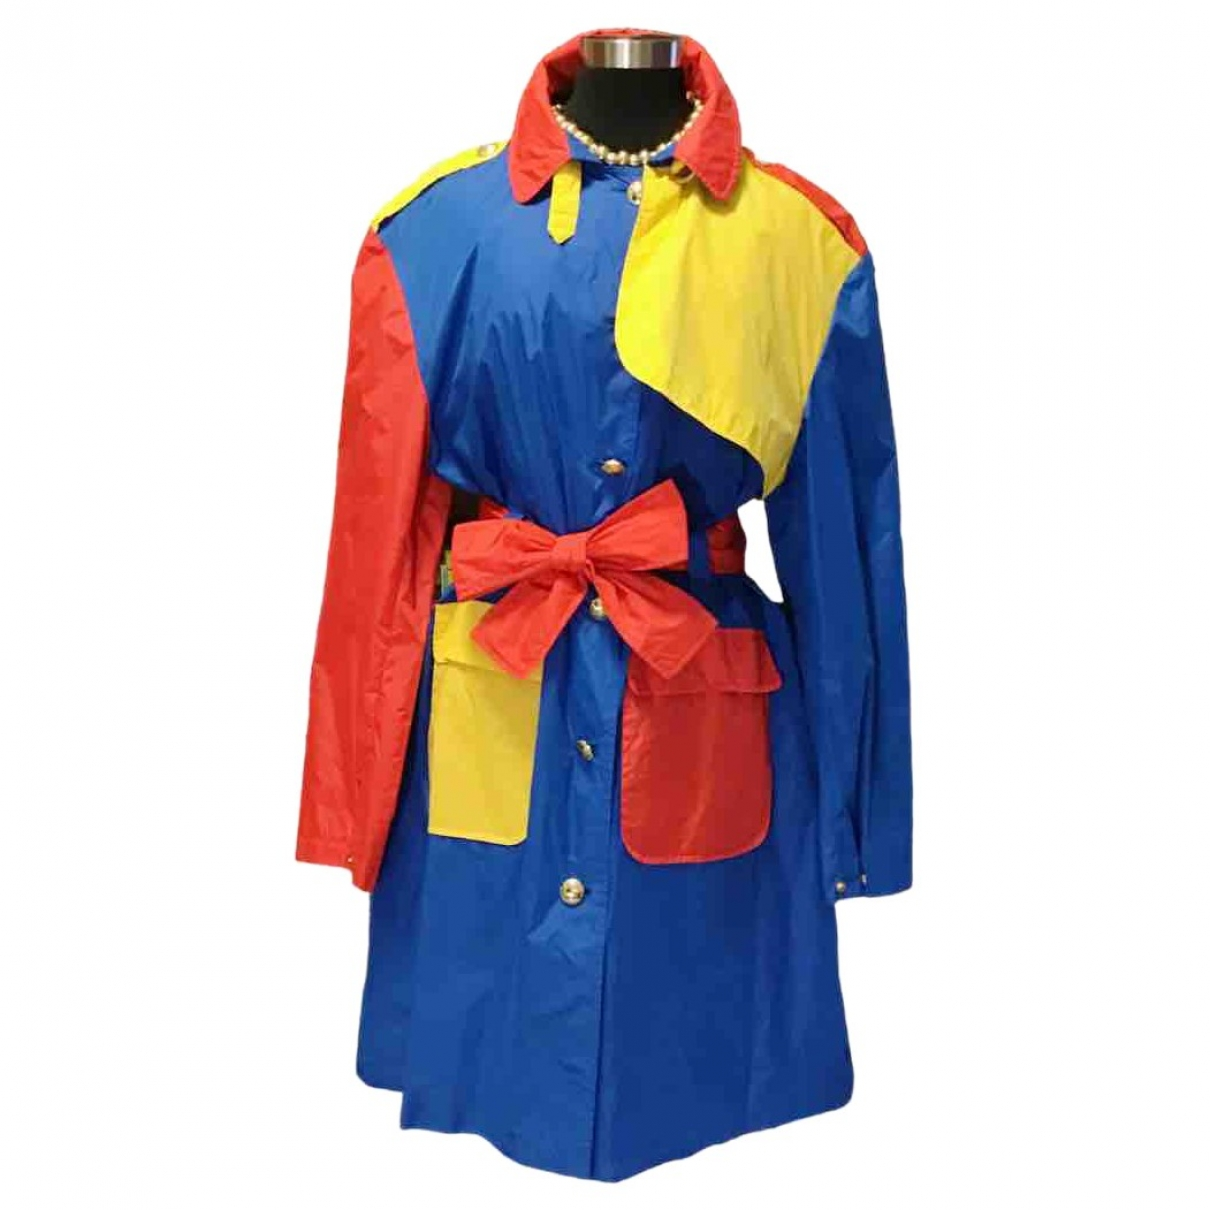 Jc De Castelbajac \N Multicolour Trench coat for Women 46 IT